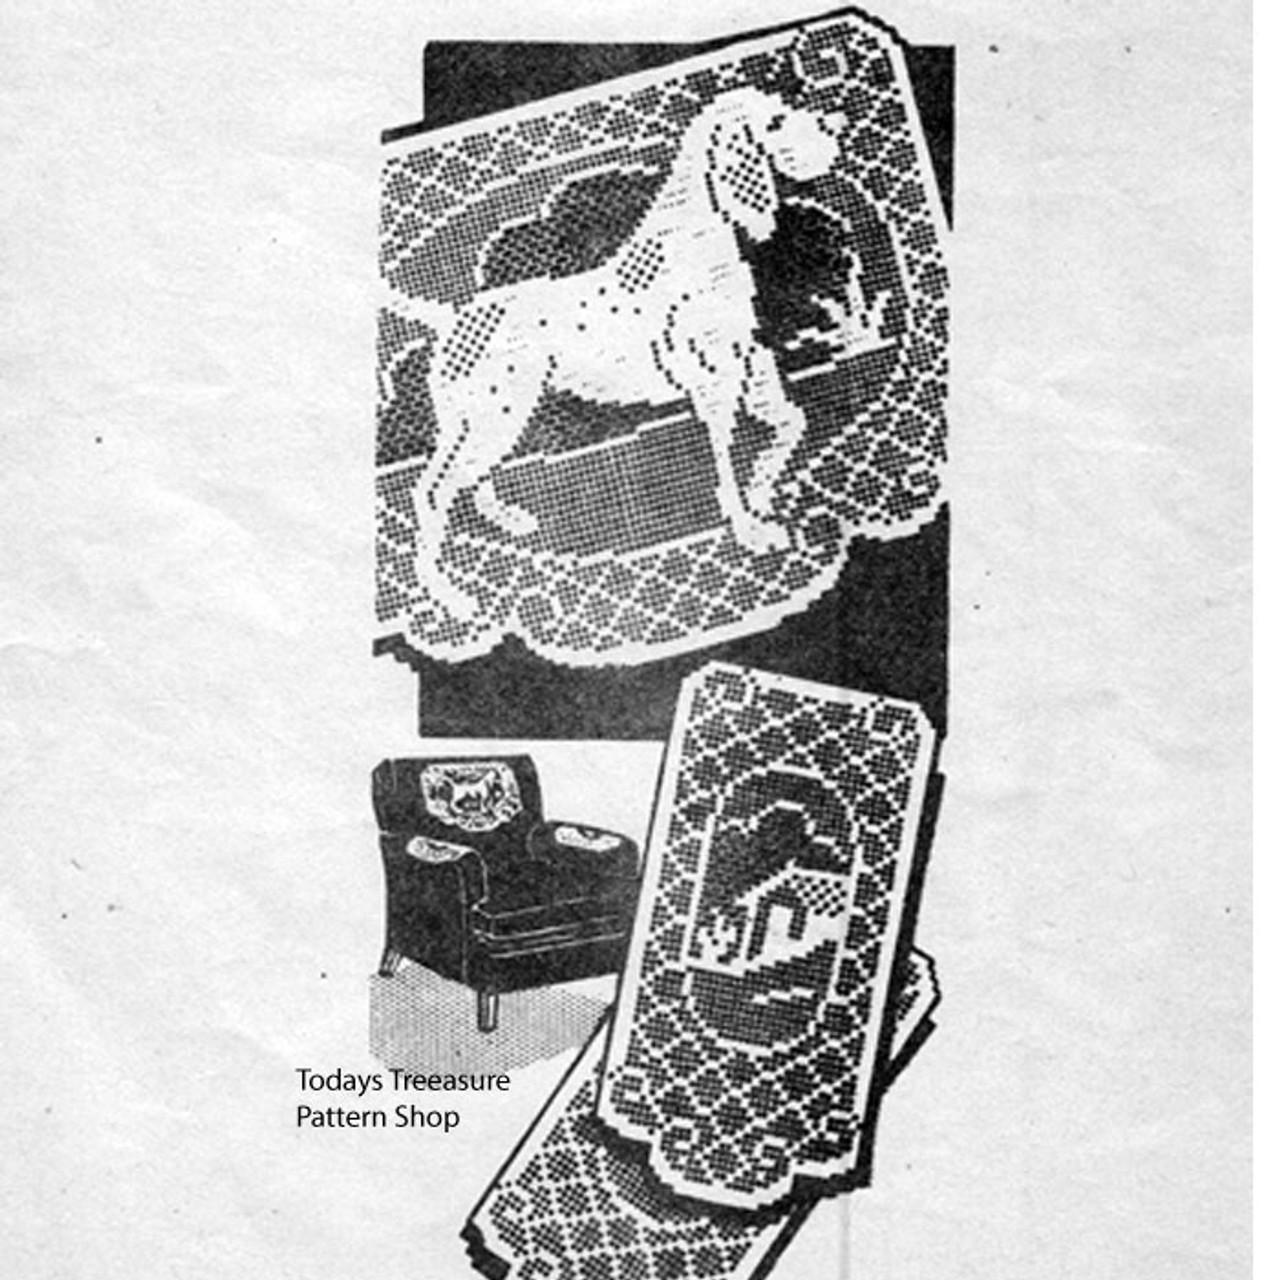 Pointing Dog Filet Crochet Scarf Pattern No 3159